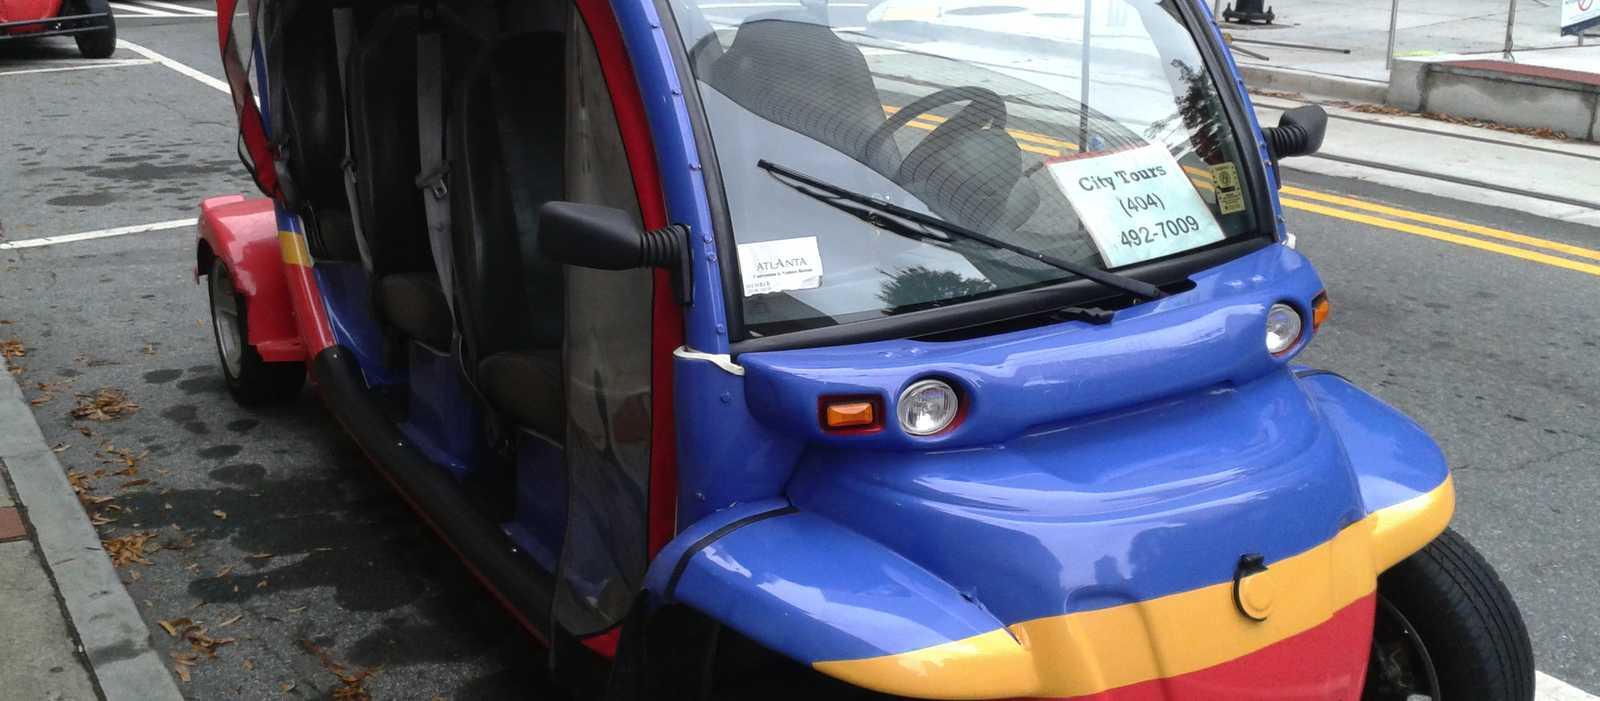 ATL-Cruzers Elektro-Auto